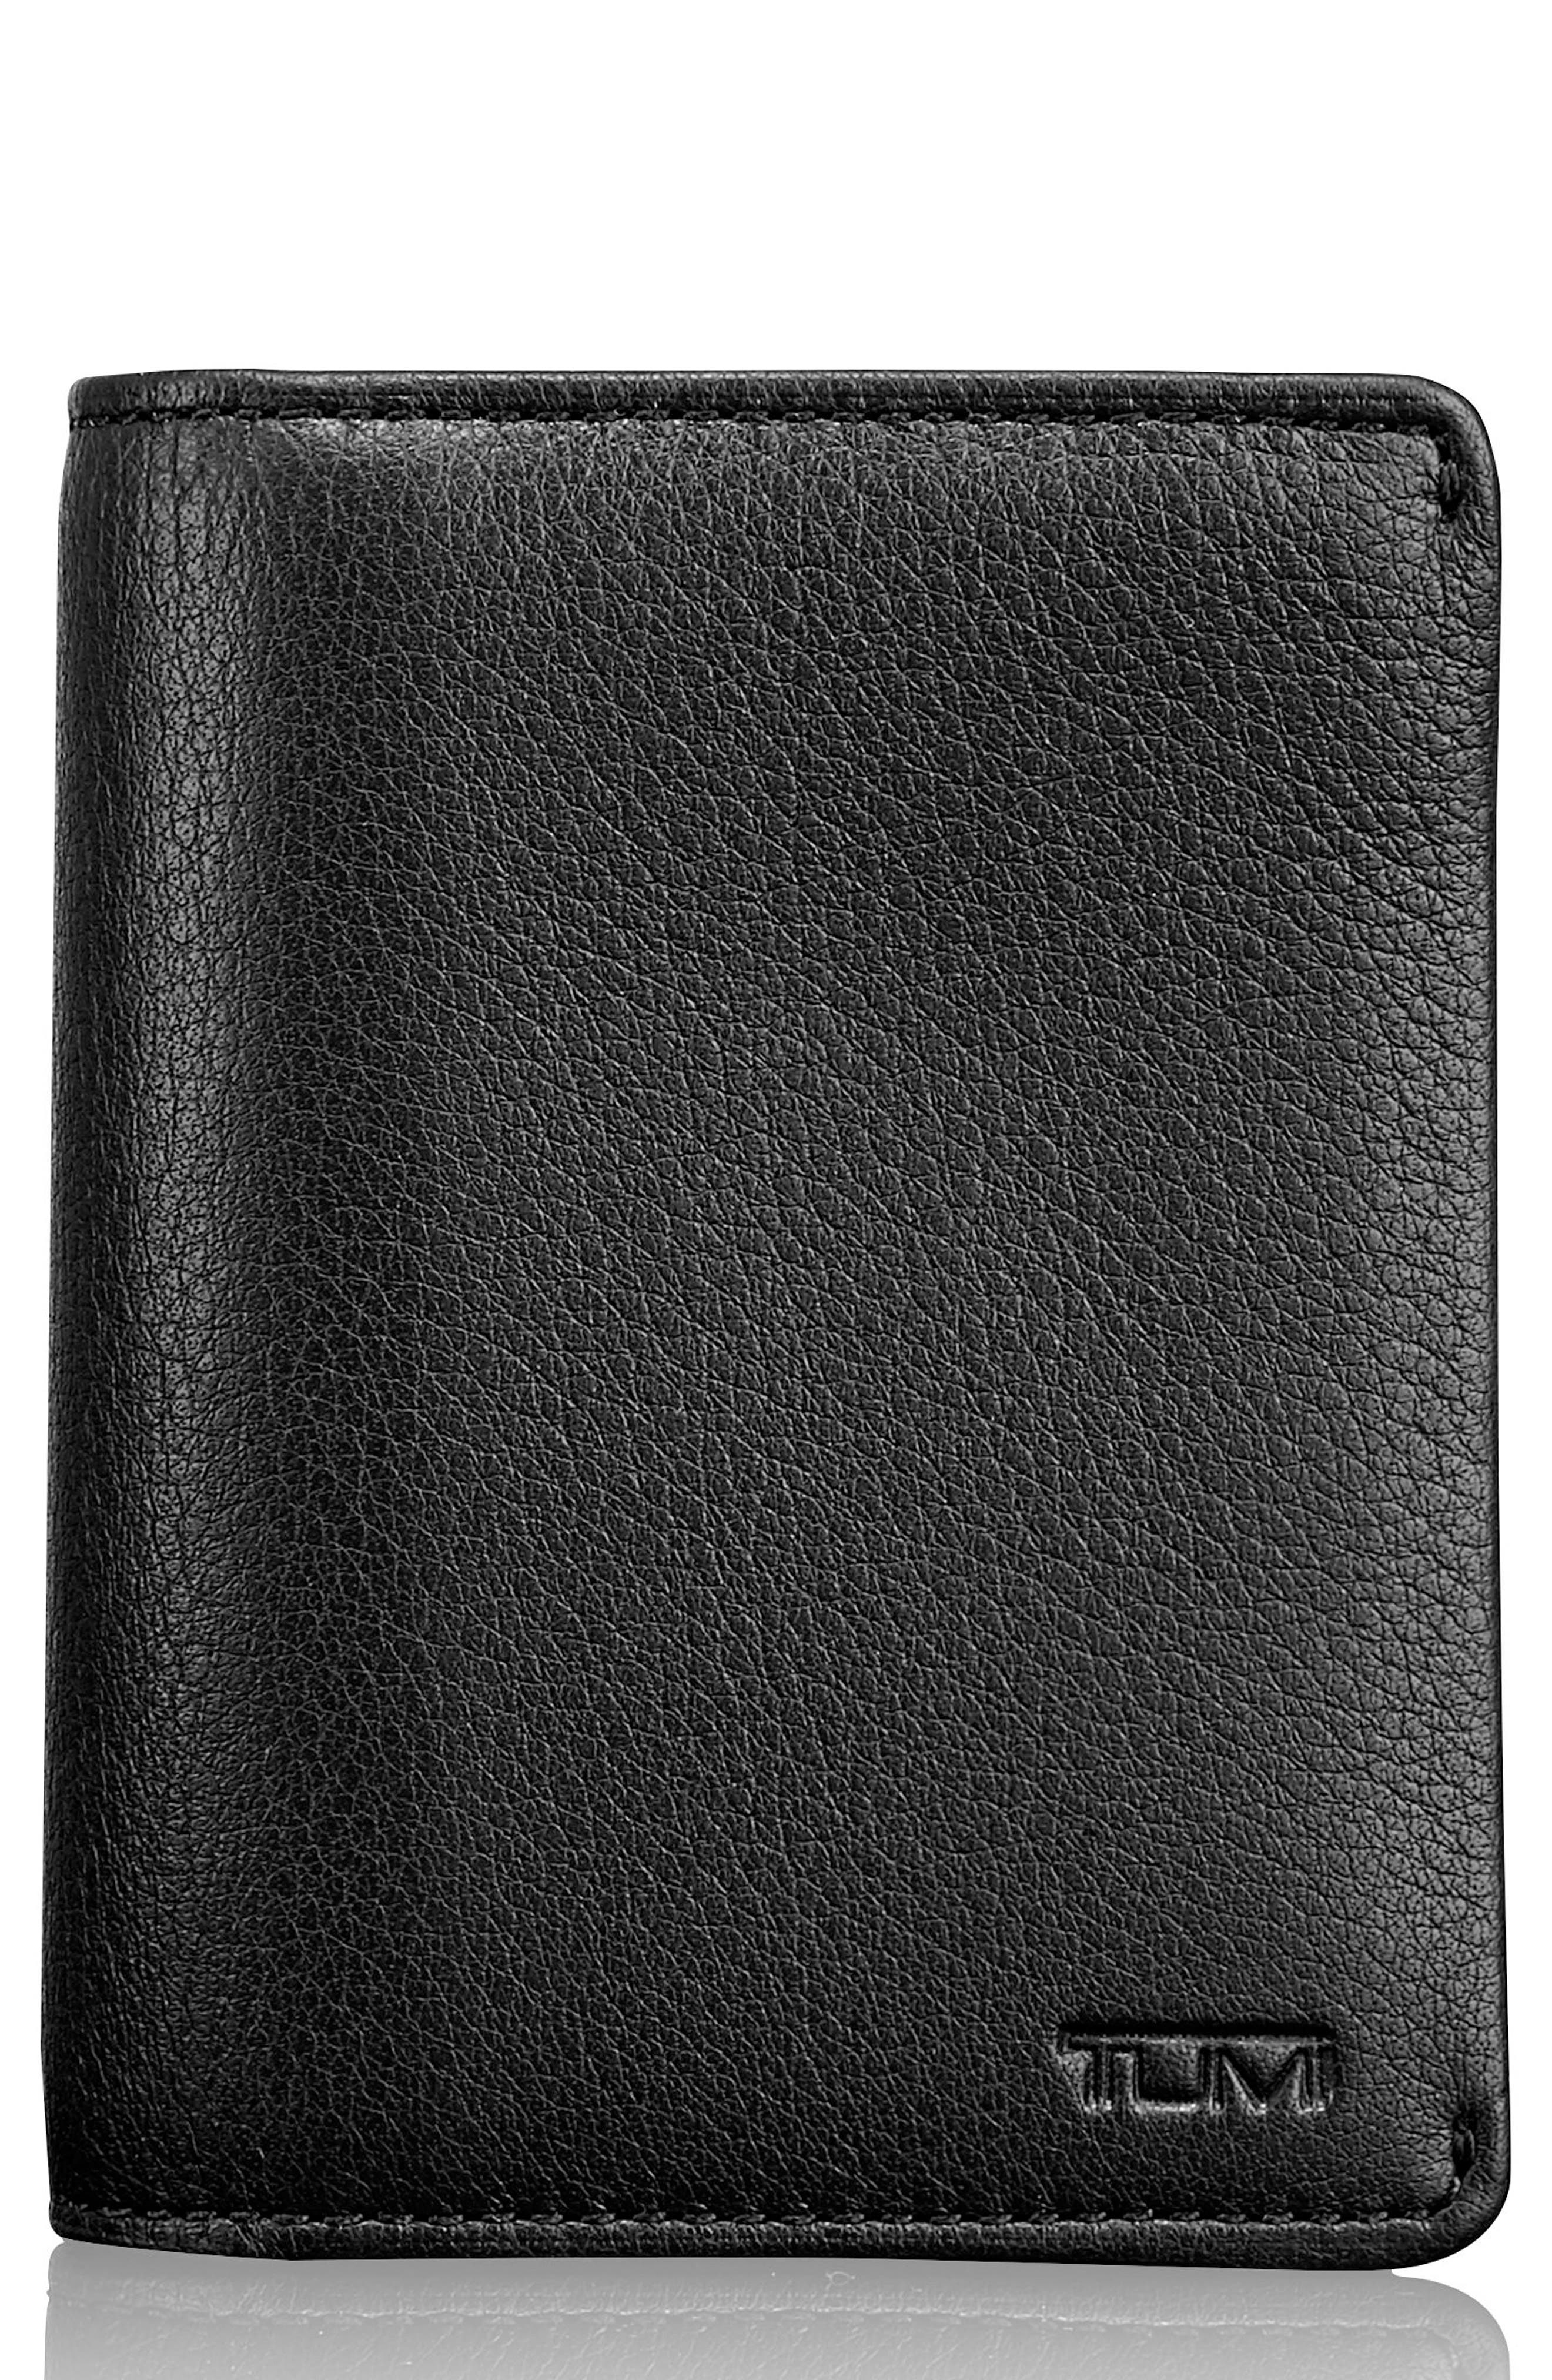 TUMI,                             Leather RFID Card Case,                             Main thumbnail 1, color,                             BLACK TEXTURED